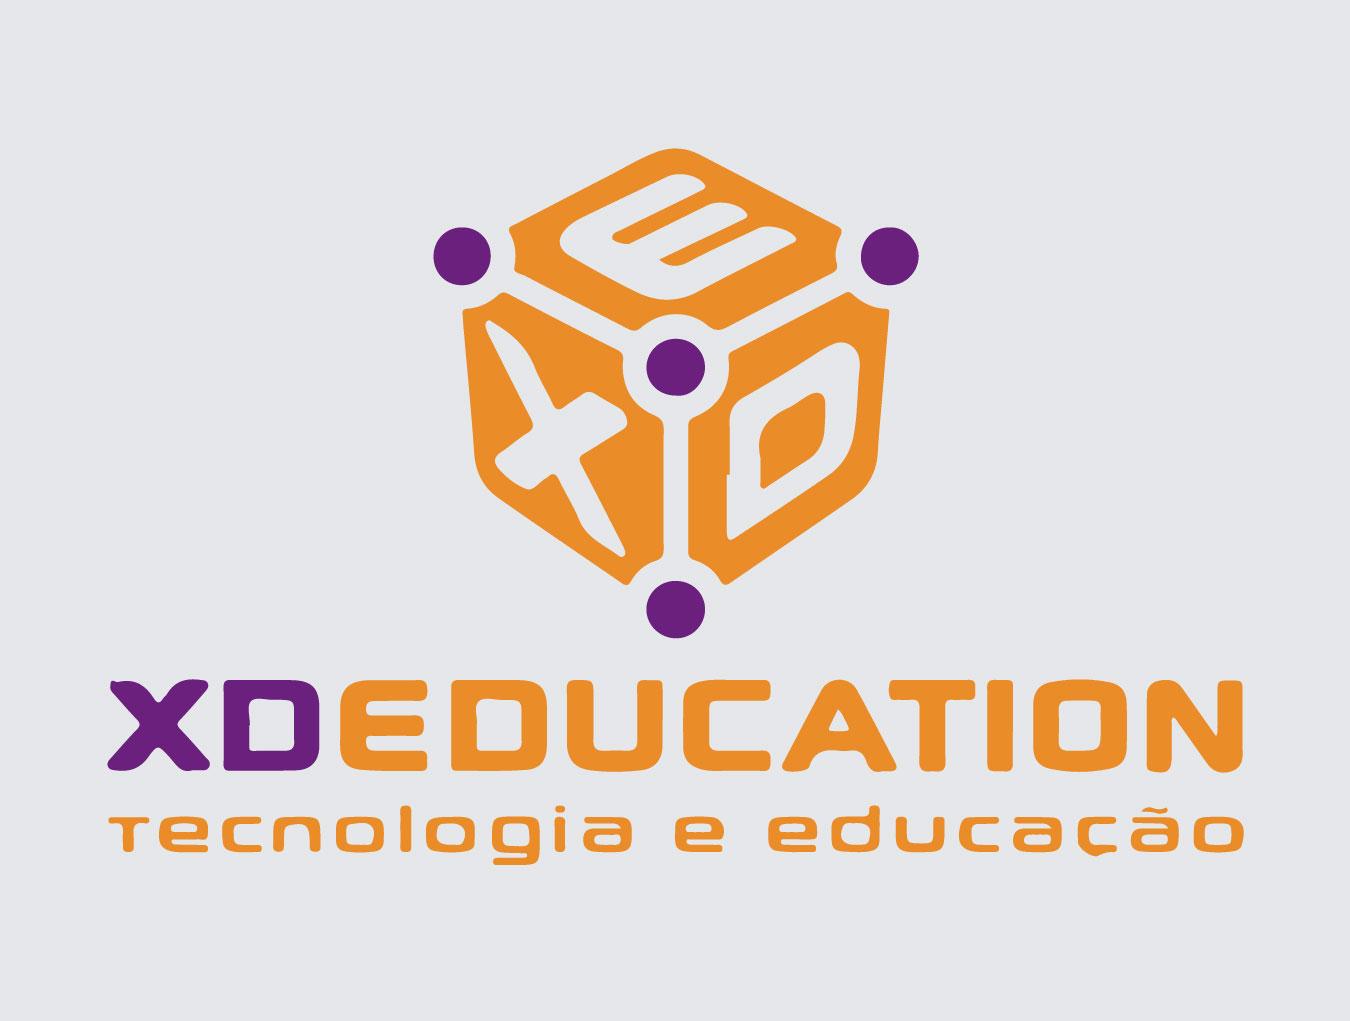 XD EDUCATION 3D